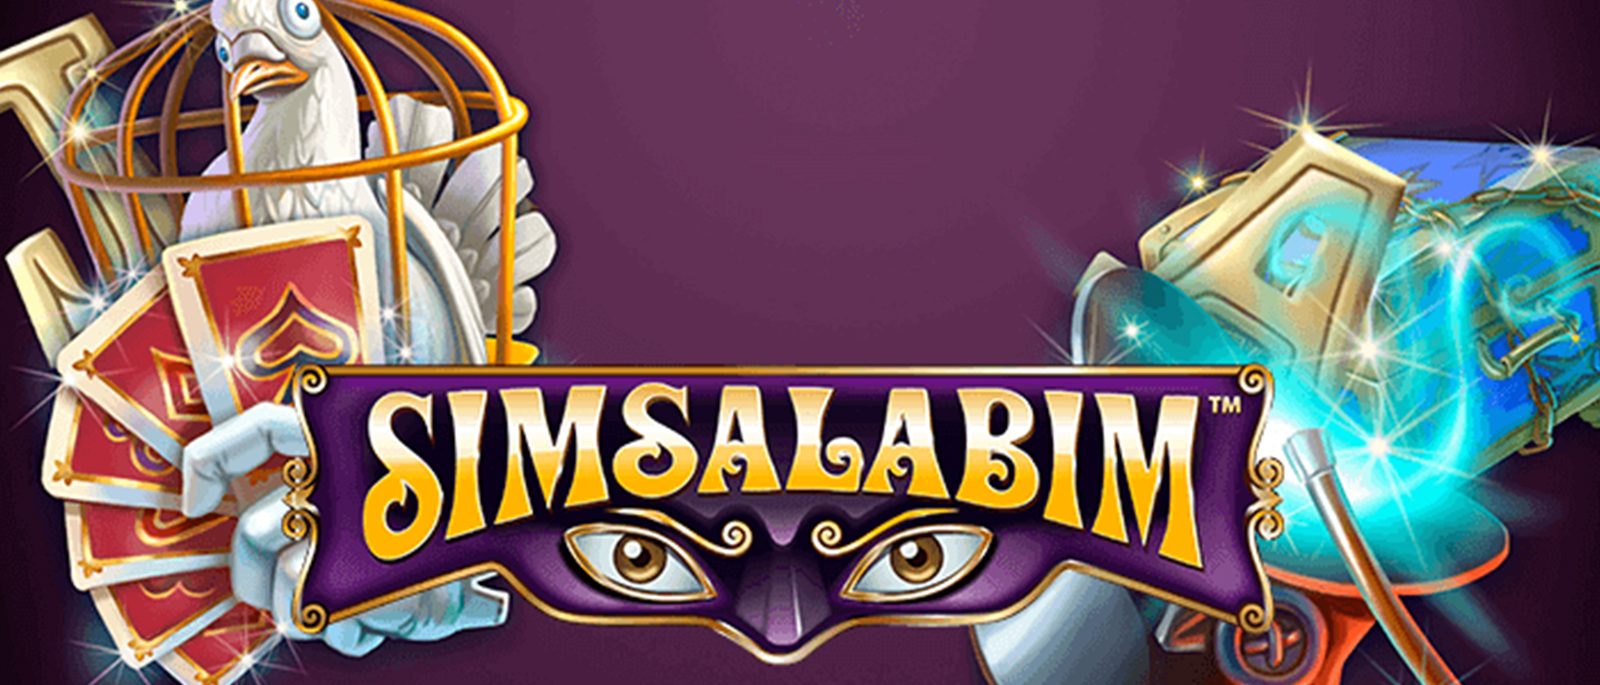 Simsalabim Slot - NetEnt Casino - Rizk Online Casino Deutschland